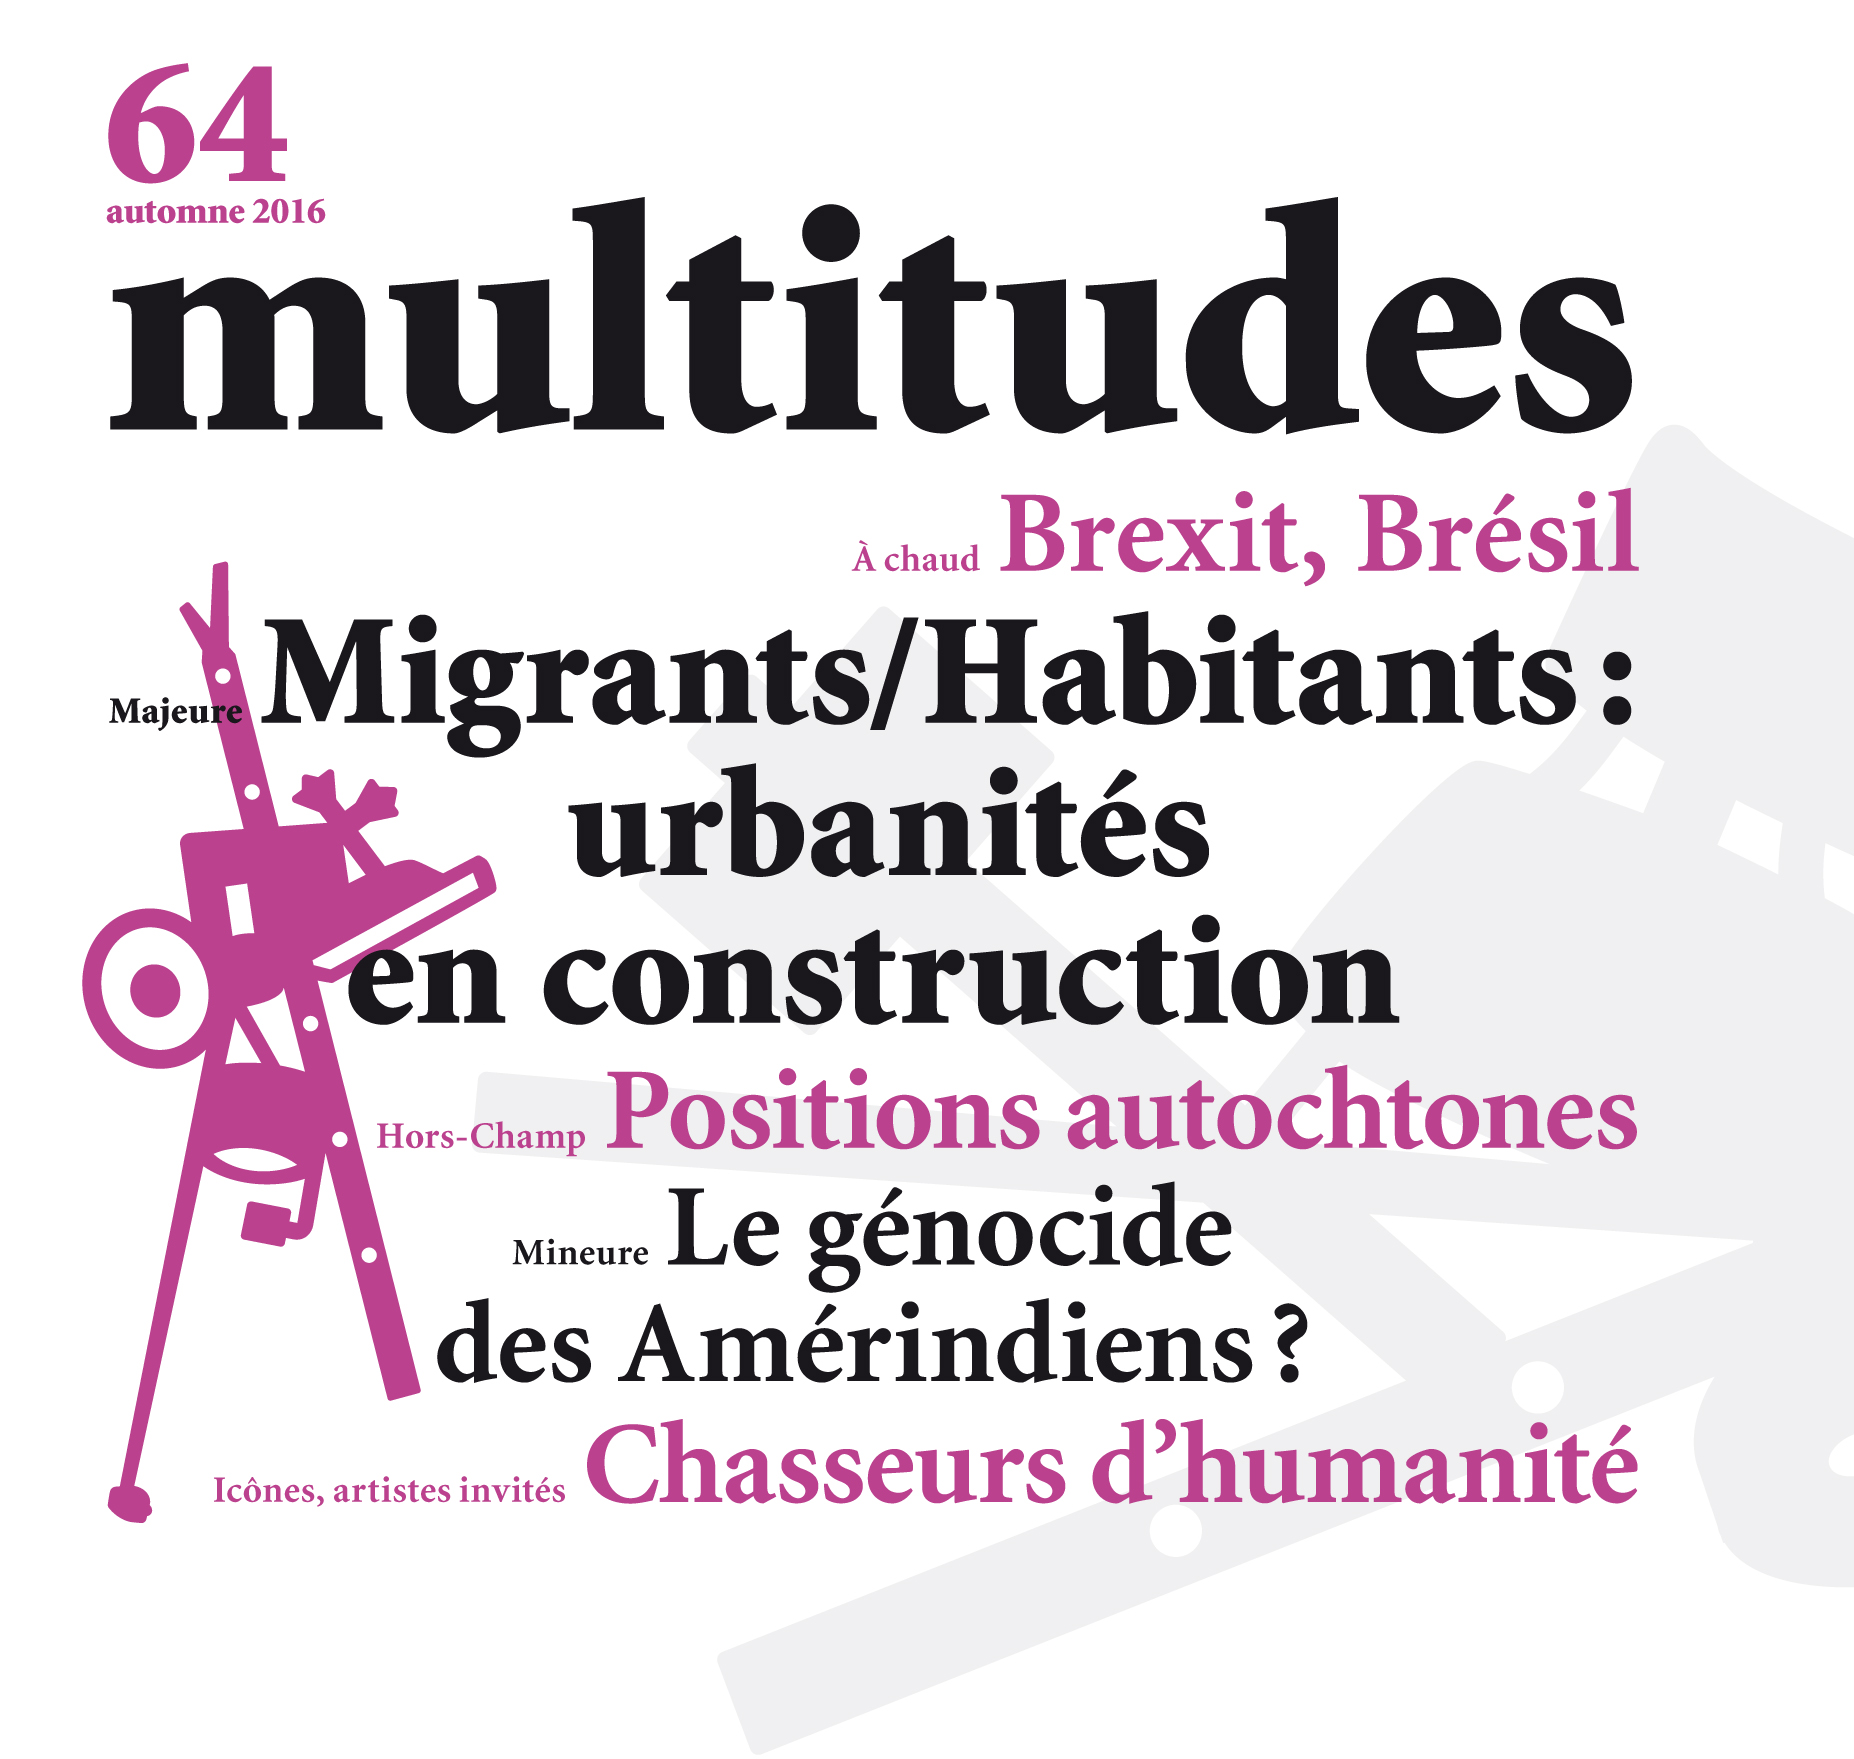 multitudes cover 64 2016